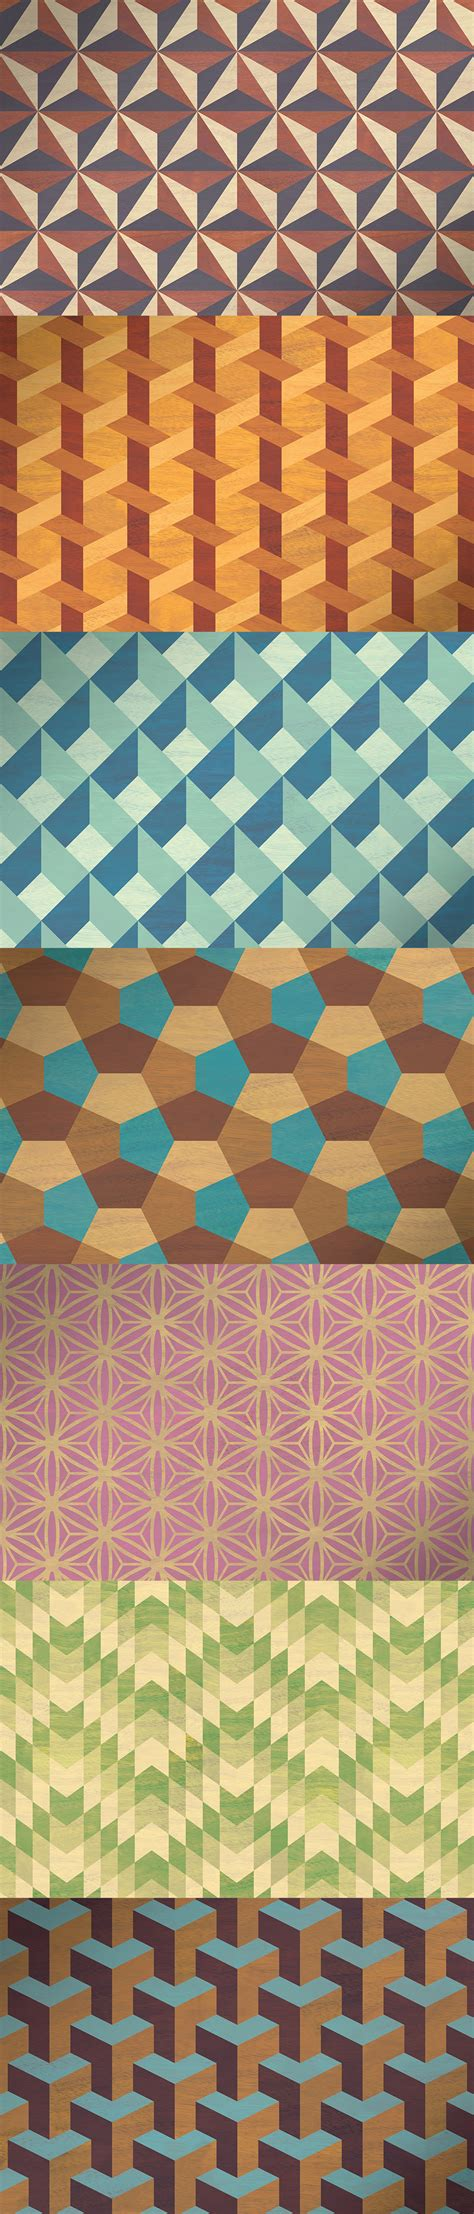 geometric marquetry patterns  retro seamless patterns